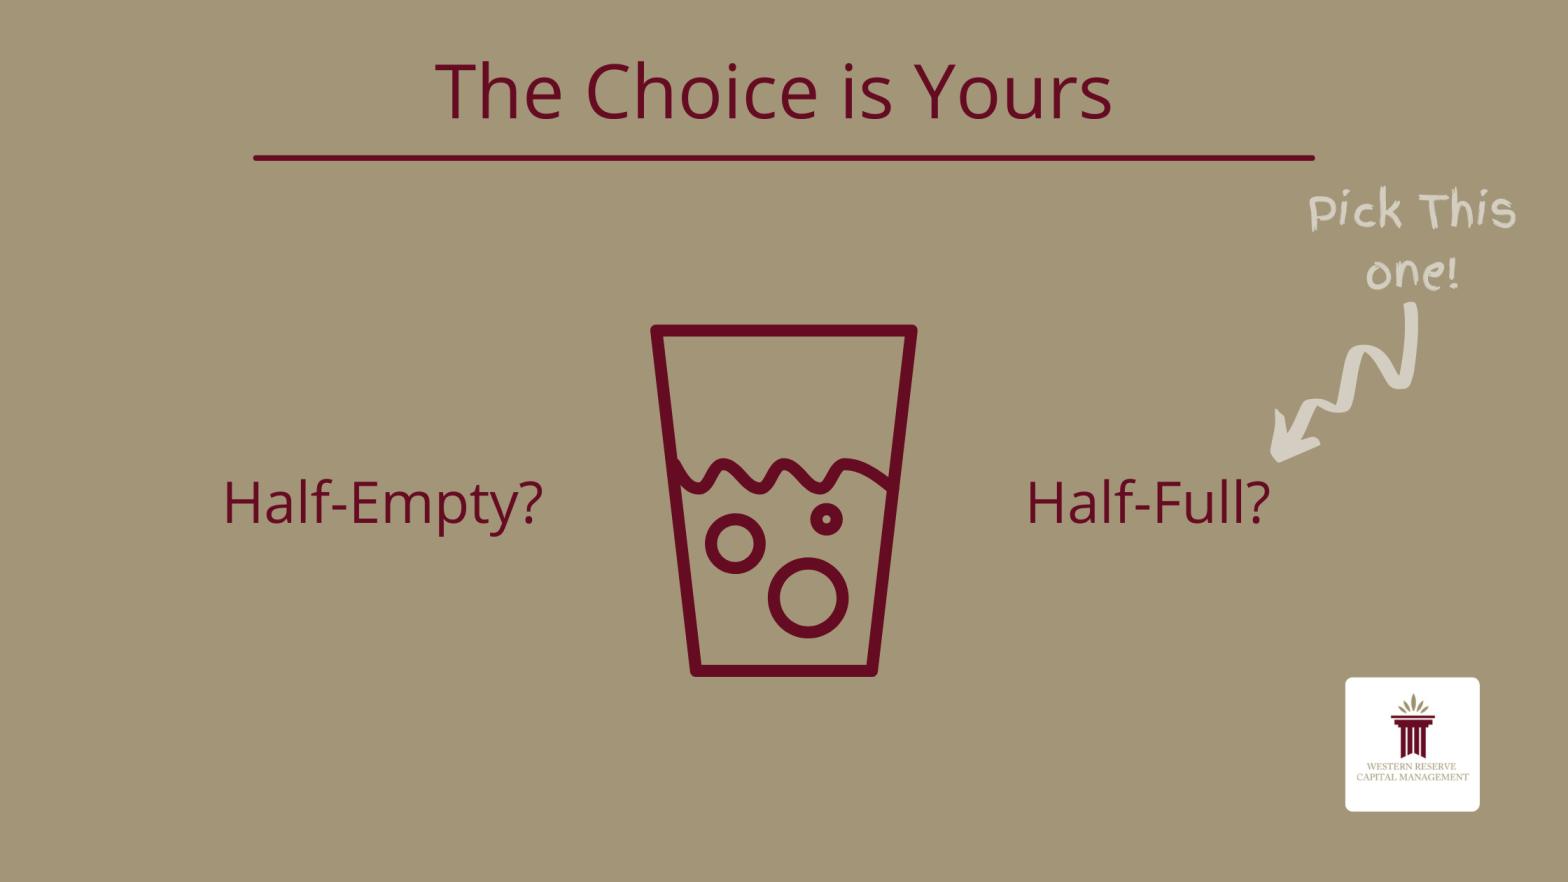 Glass Half-Full Thinking